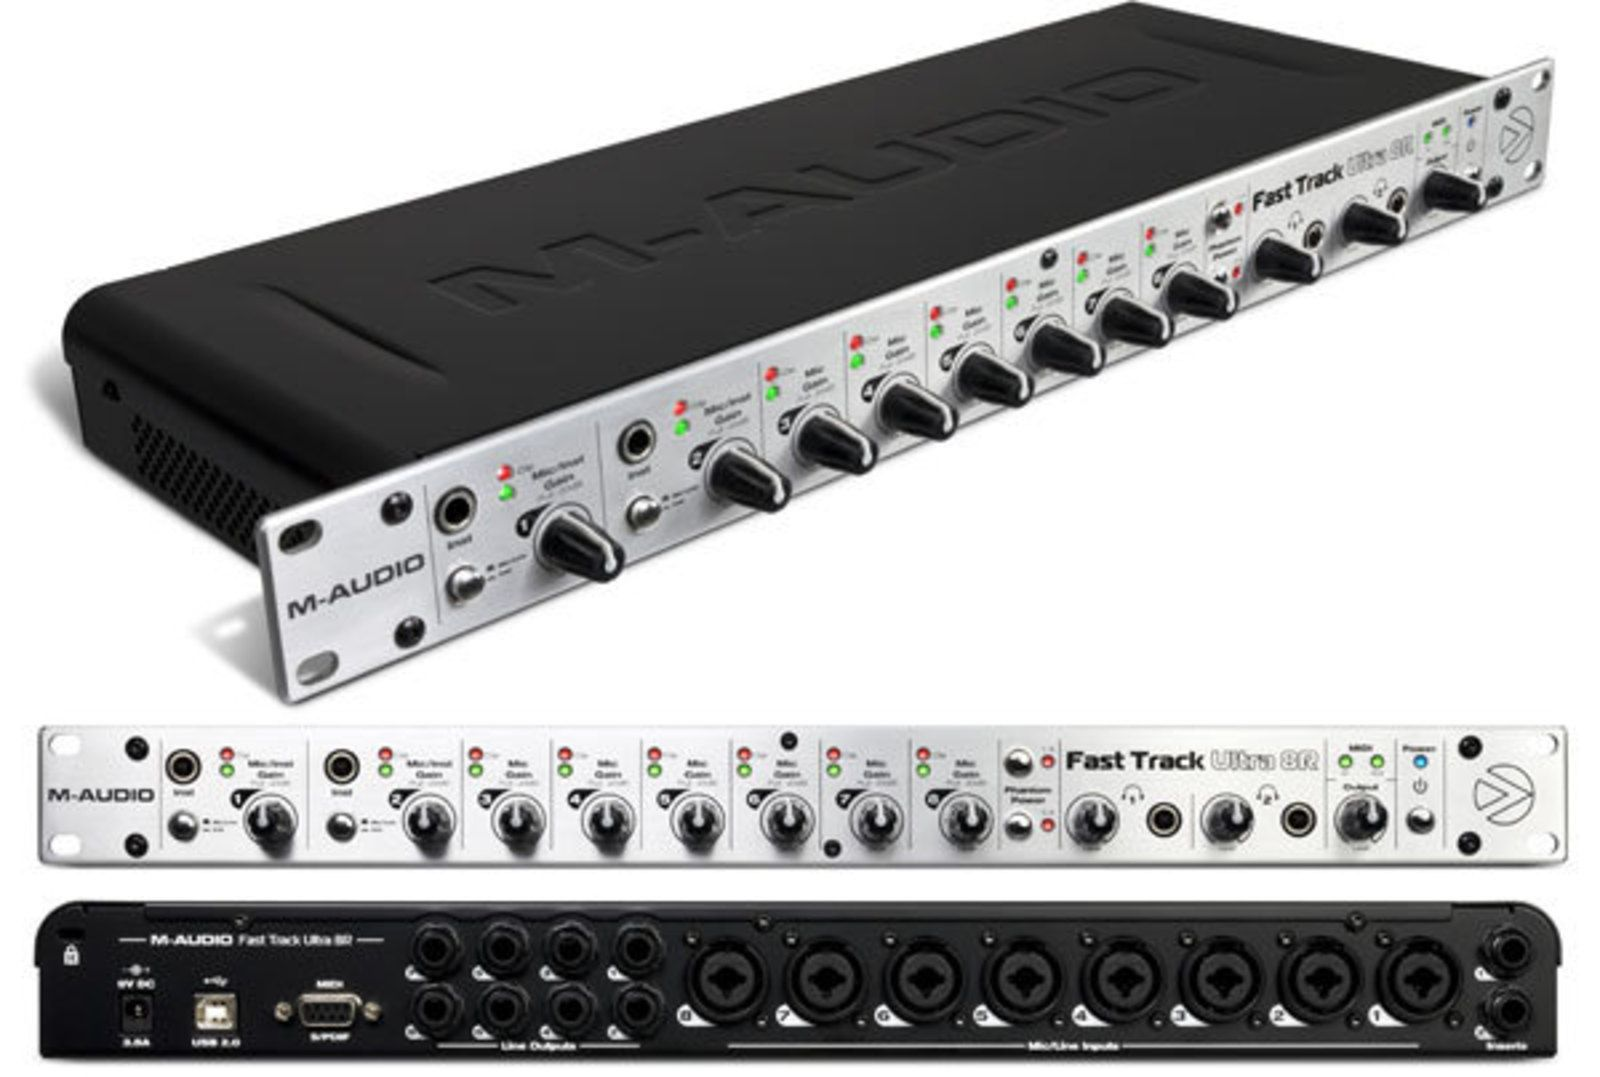 M audio fast track ultra 8r 711530